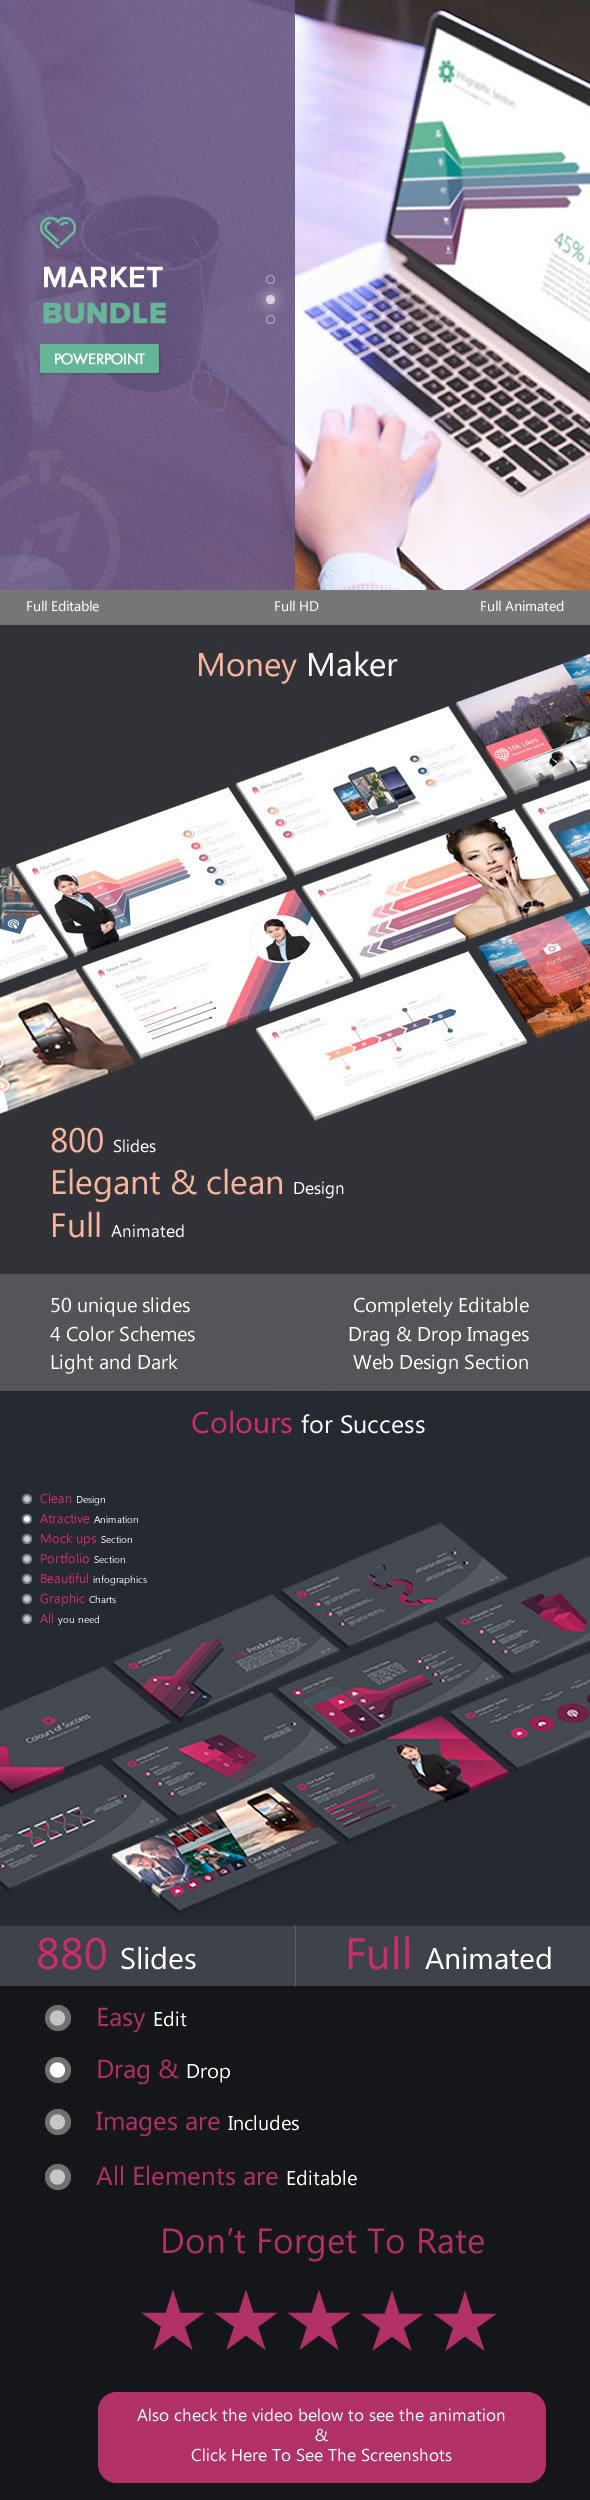 Market Bundle - PowerPoint Templates Presentation Templates